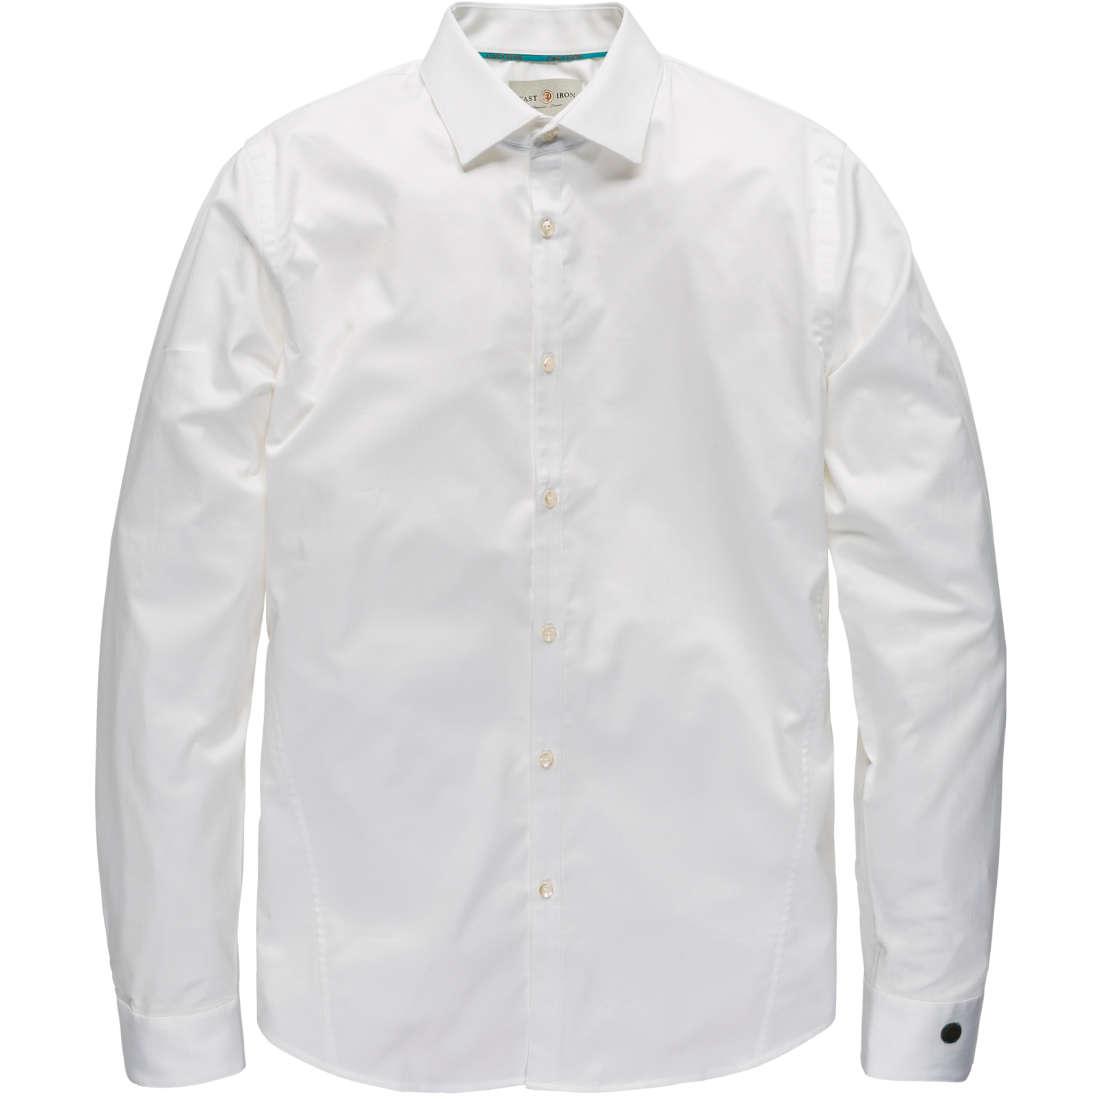 Overhemd Wit Slim Fit.Cast Iron Overhemd Slim Fit Csi00429 In Het Wit